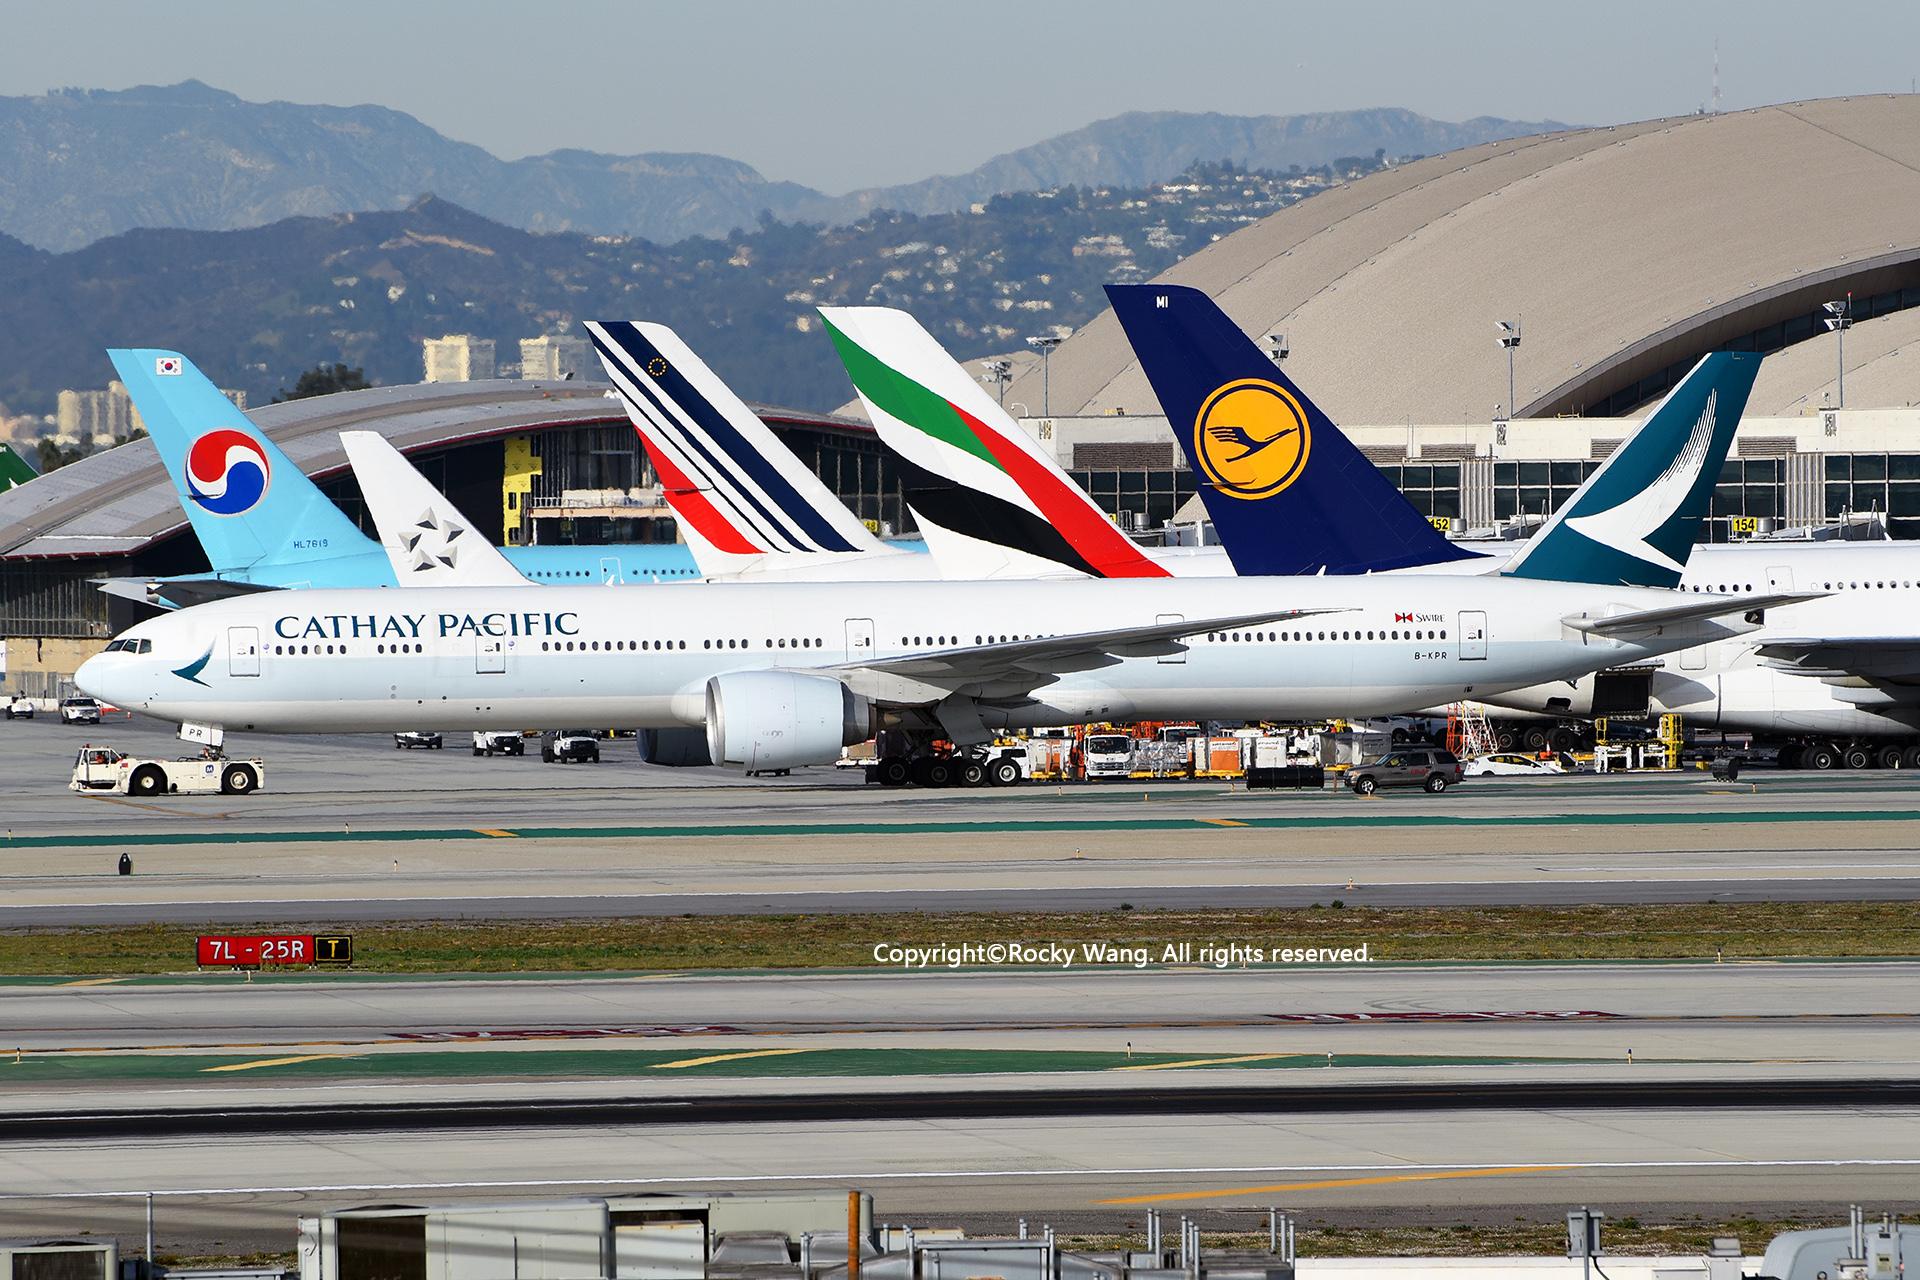 Re:[原创]居家了 批量处理老图 倾情奉献52家777 BOEING 777-367ER B-KPR Los Angeles Int'l Airport